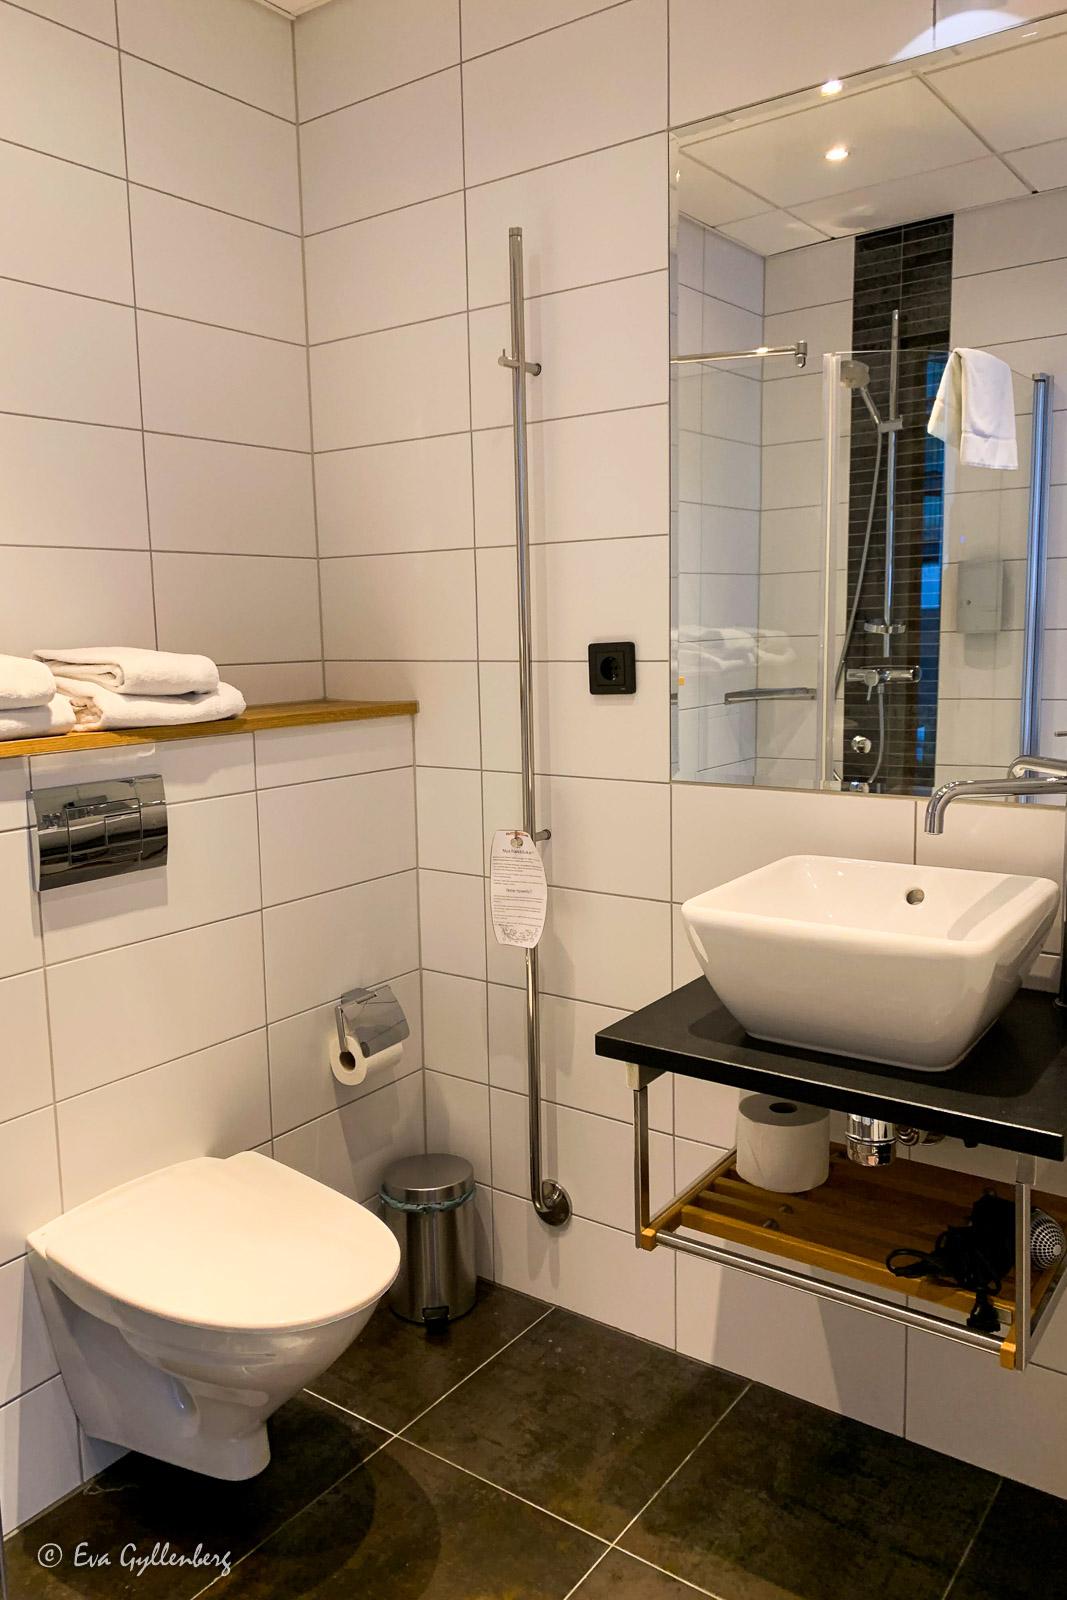 The More Hotel - Snyggt lägenhetshotell i Lund 14